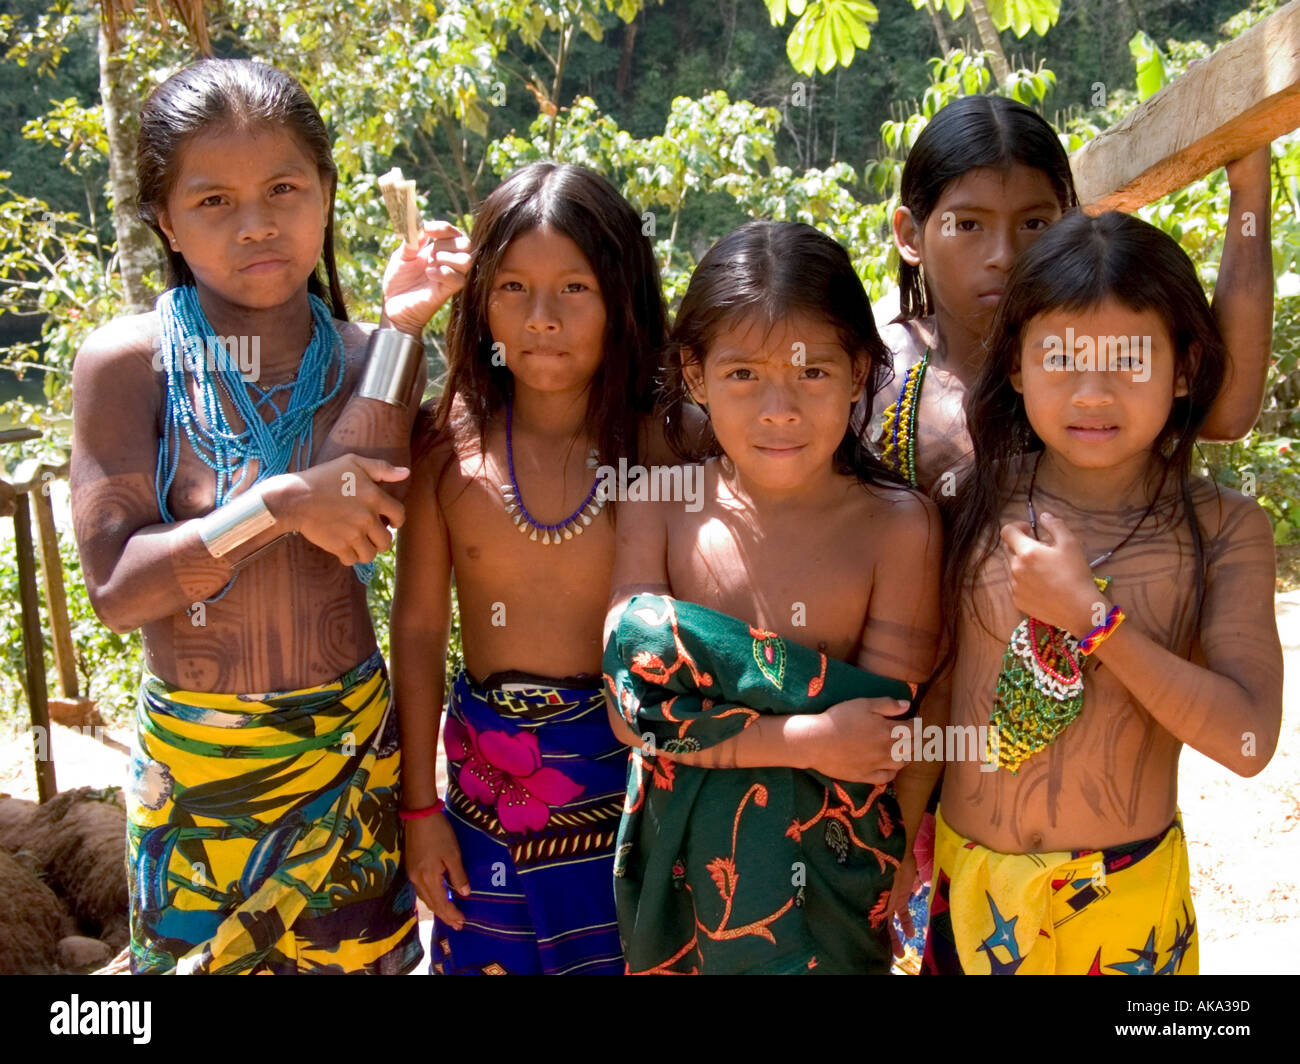 Panama girls photos